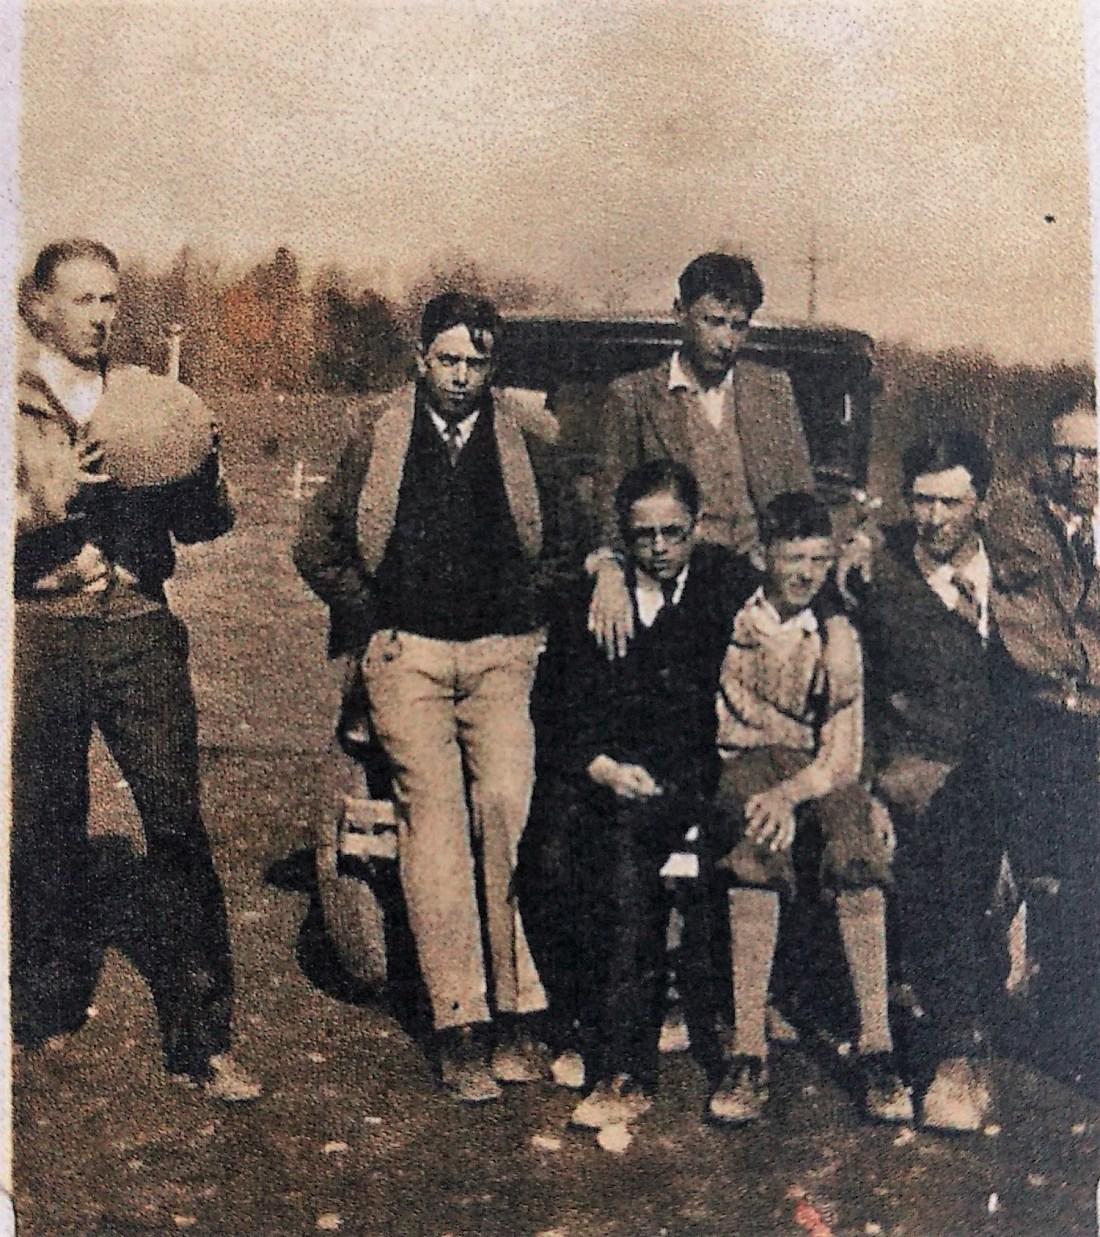 Bill Starkey, Carridon Grisso, Earl Starkey, Ronald Thomas, Loren Thomas, Roy Lemon, Donald Custer1929-1930